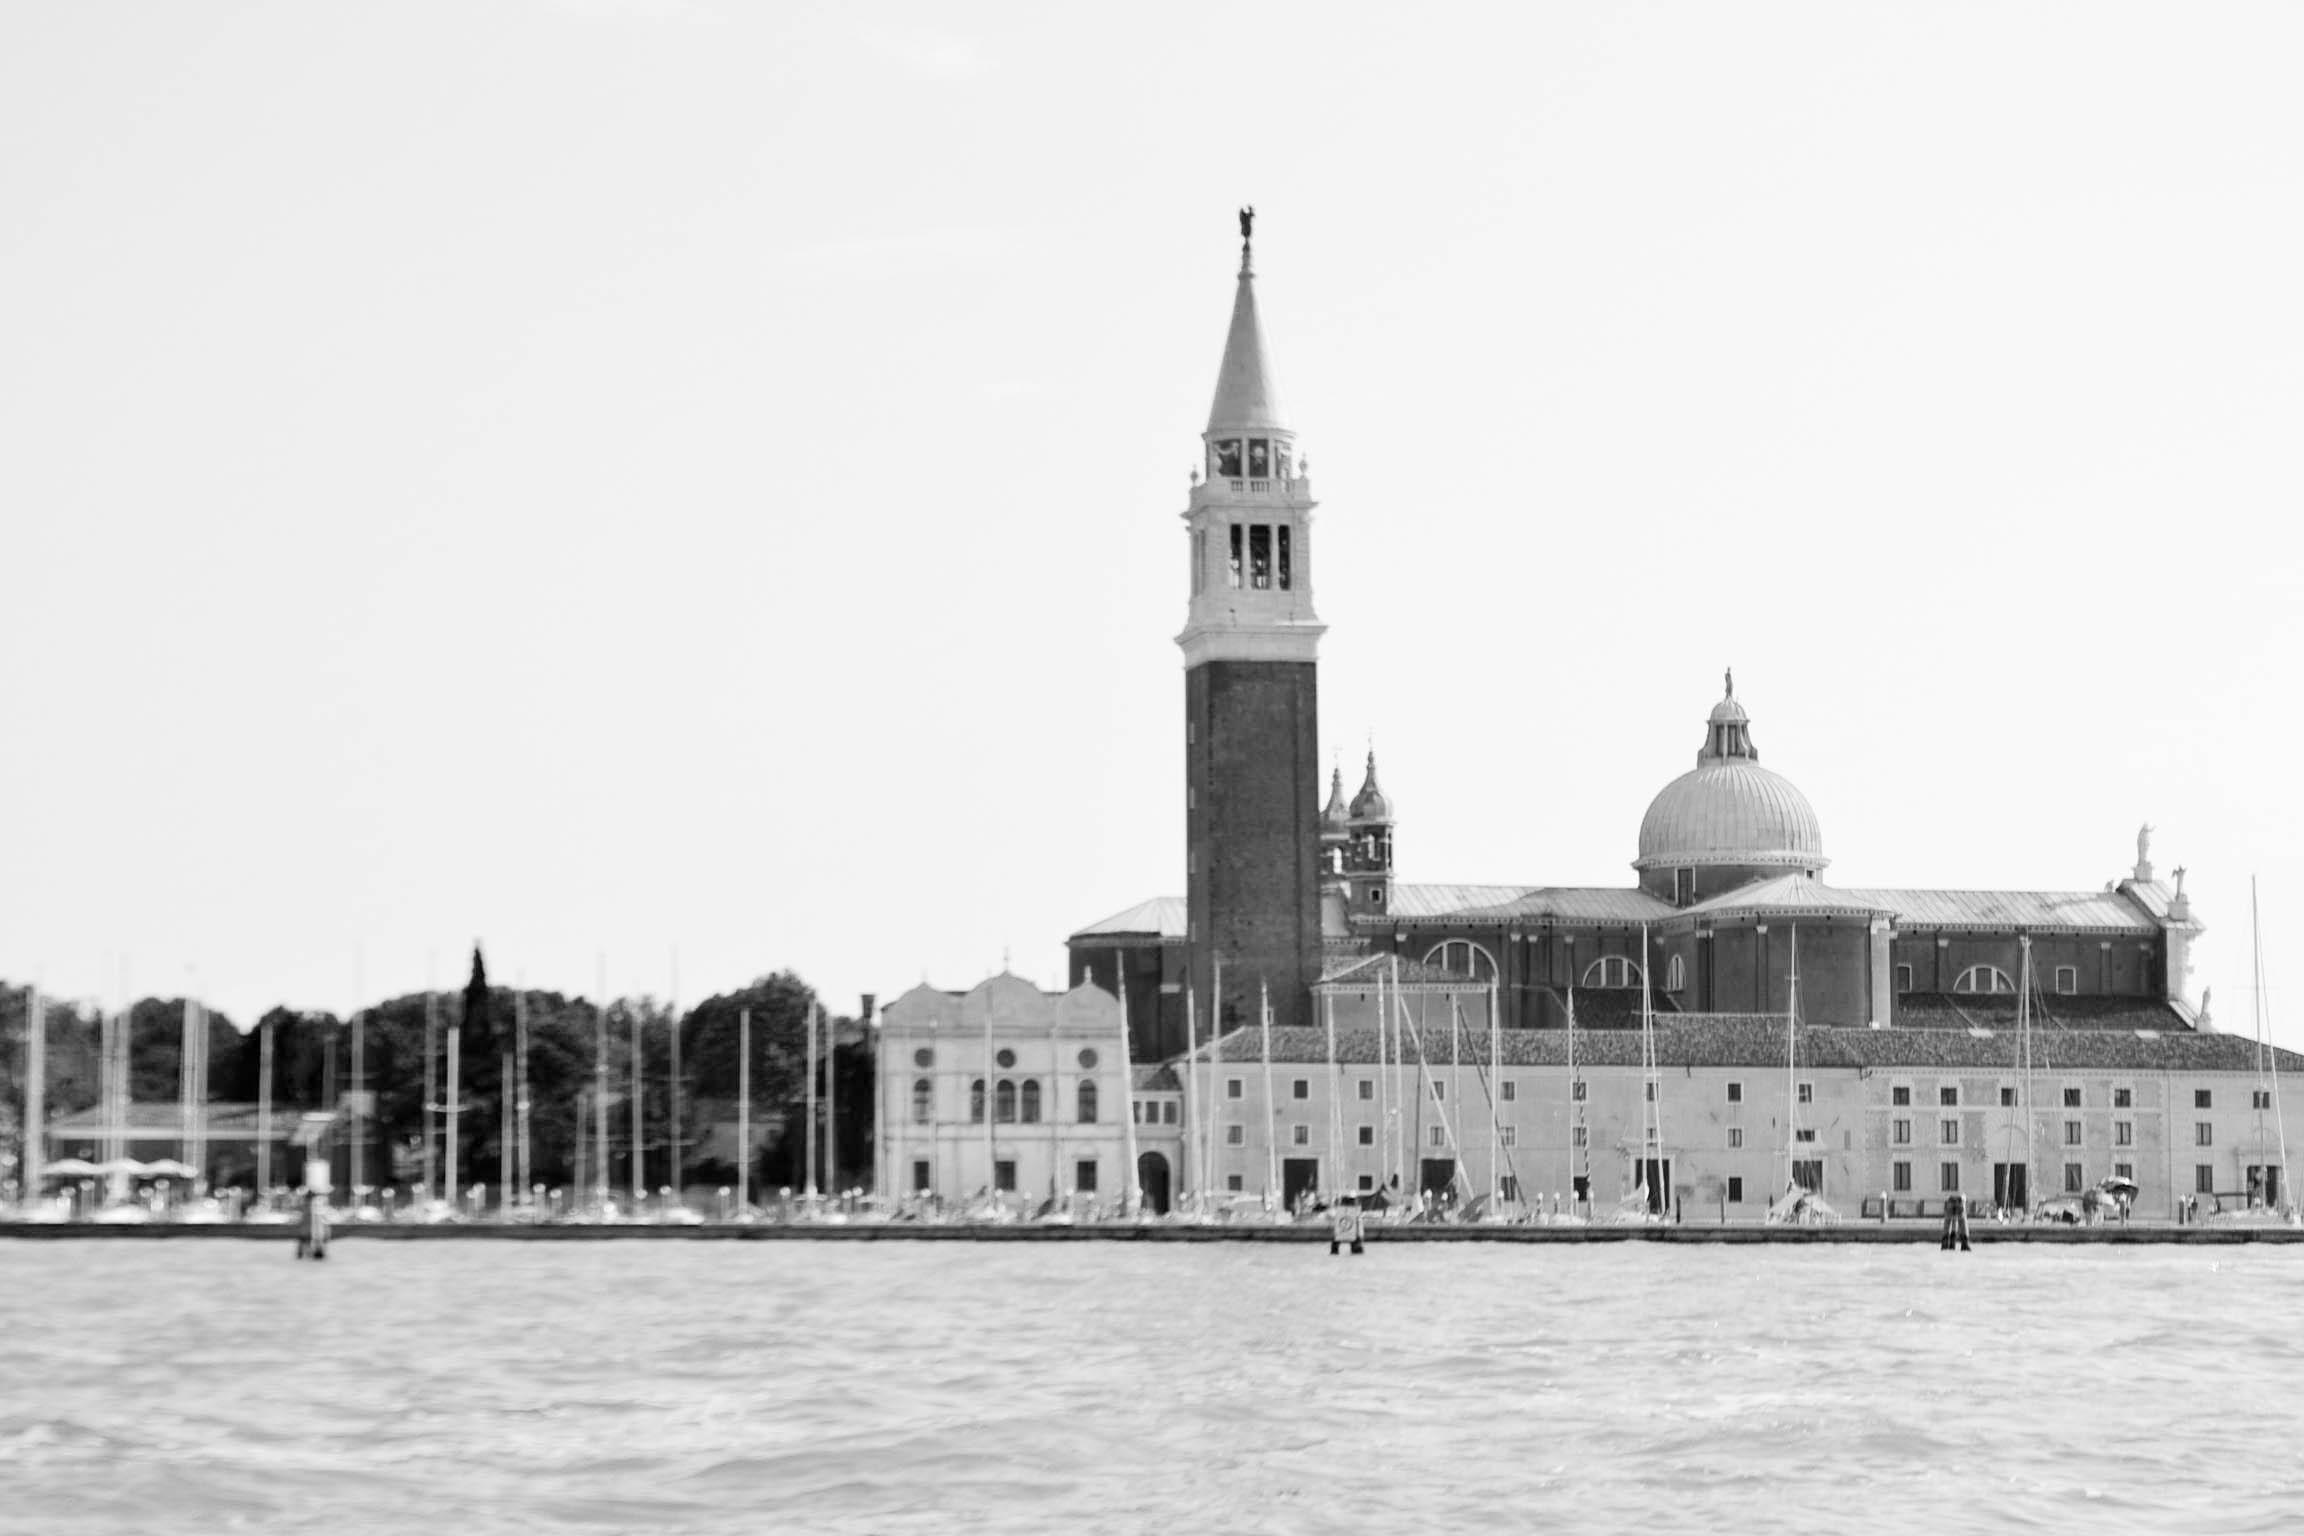 venezia_edit-37.jpg